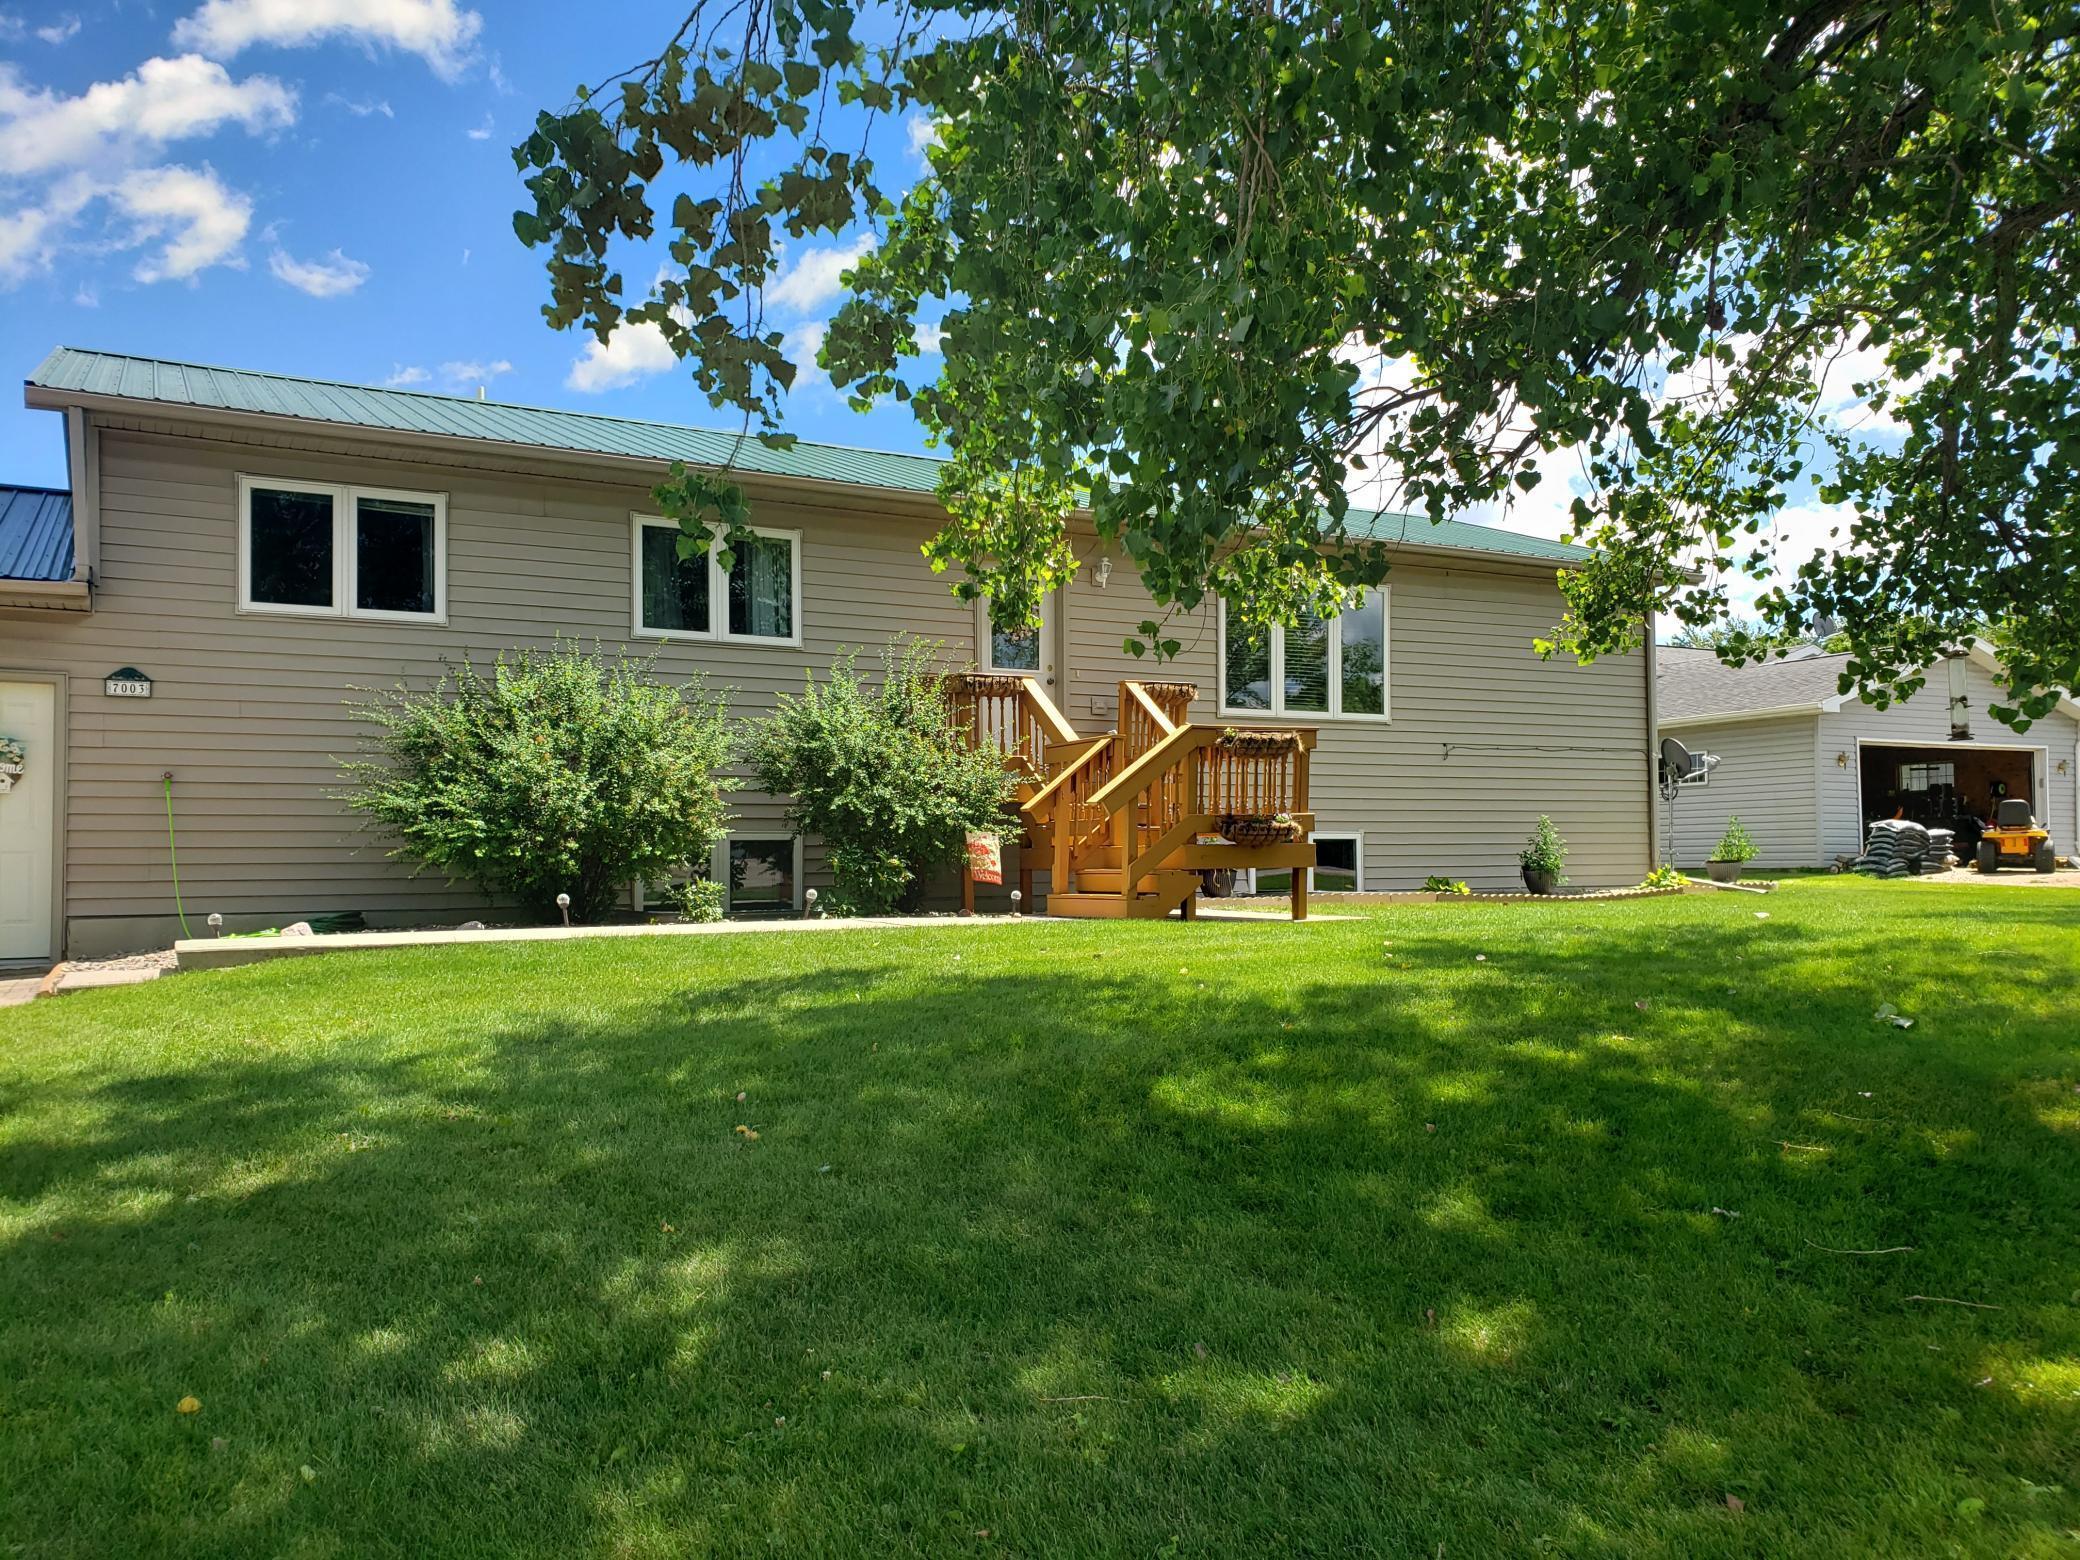 7003 4th Property Photo - Lake Park, MN real estate listing